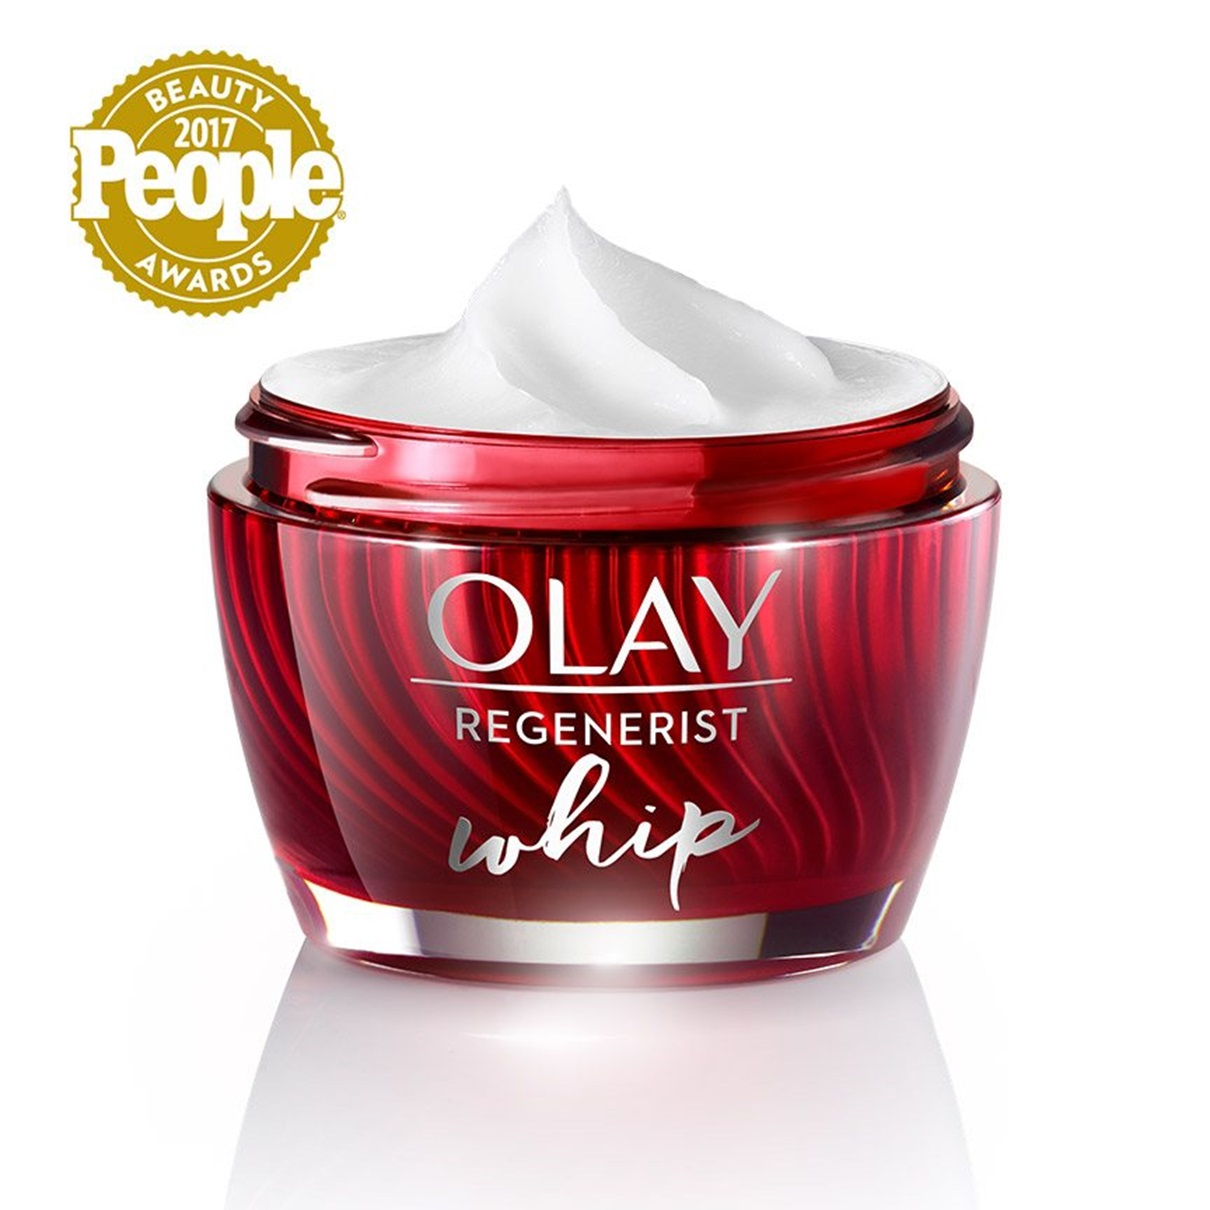 Health & Beauty Romantic Olay Of Olay Sheer Sunlight Lip Shine Invigorating Blood Circulation And Stopping Pains